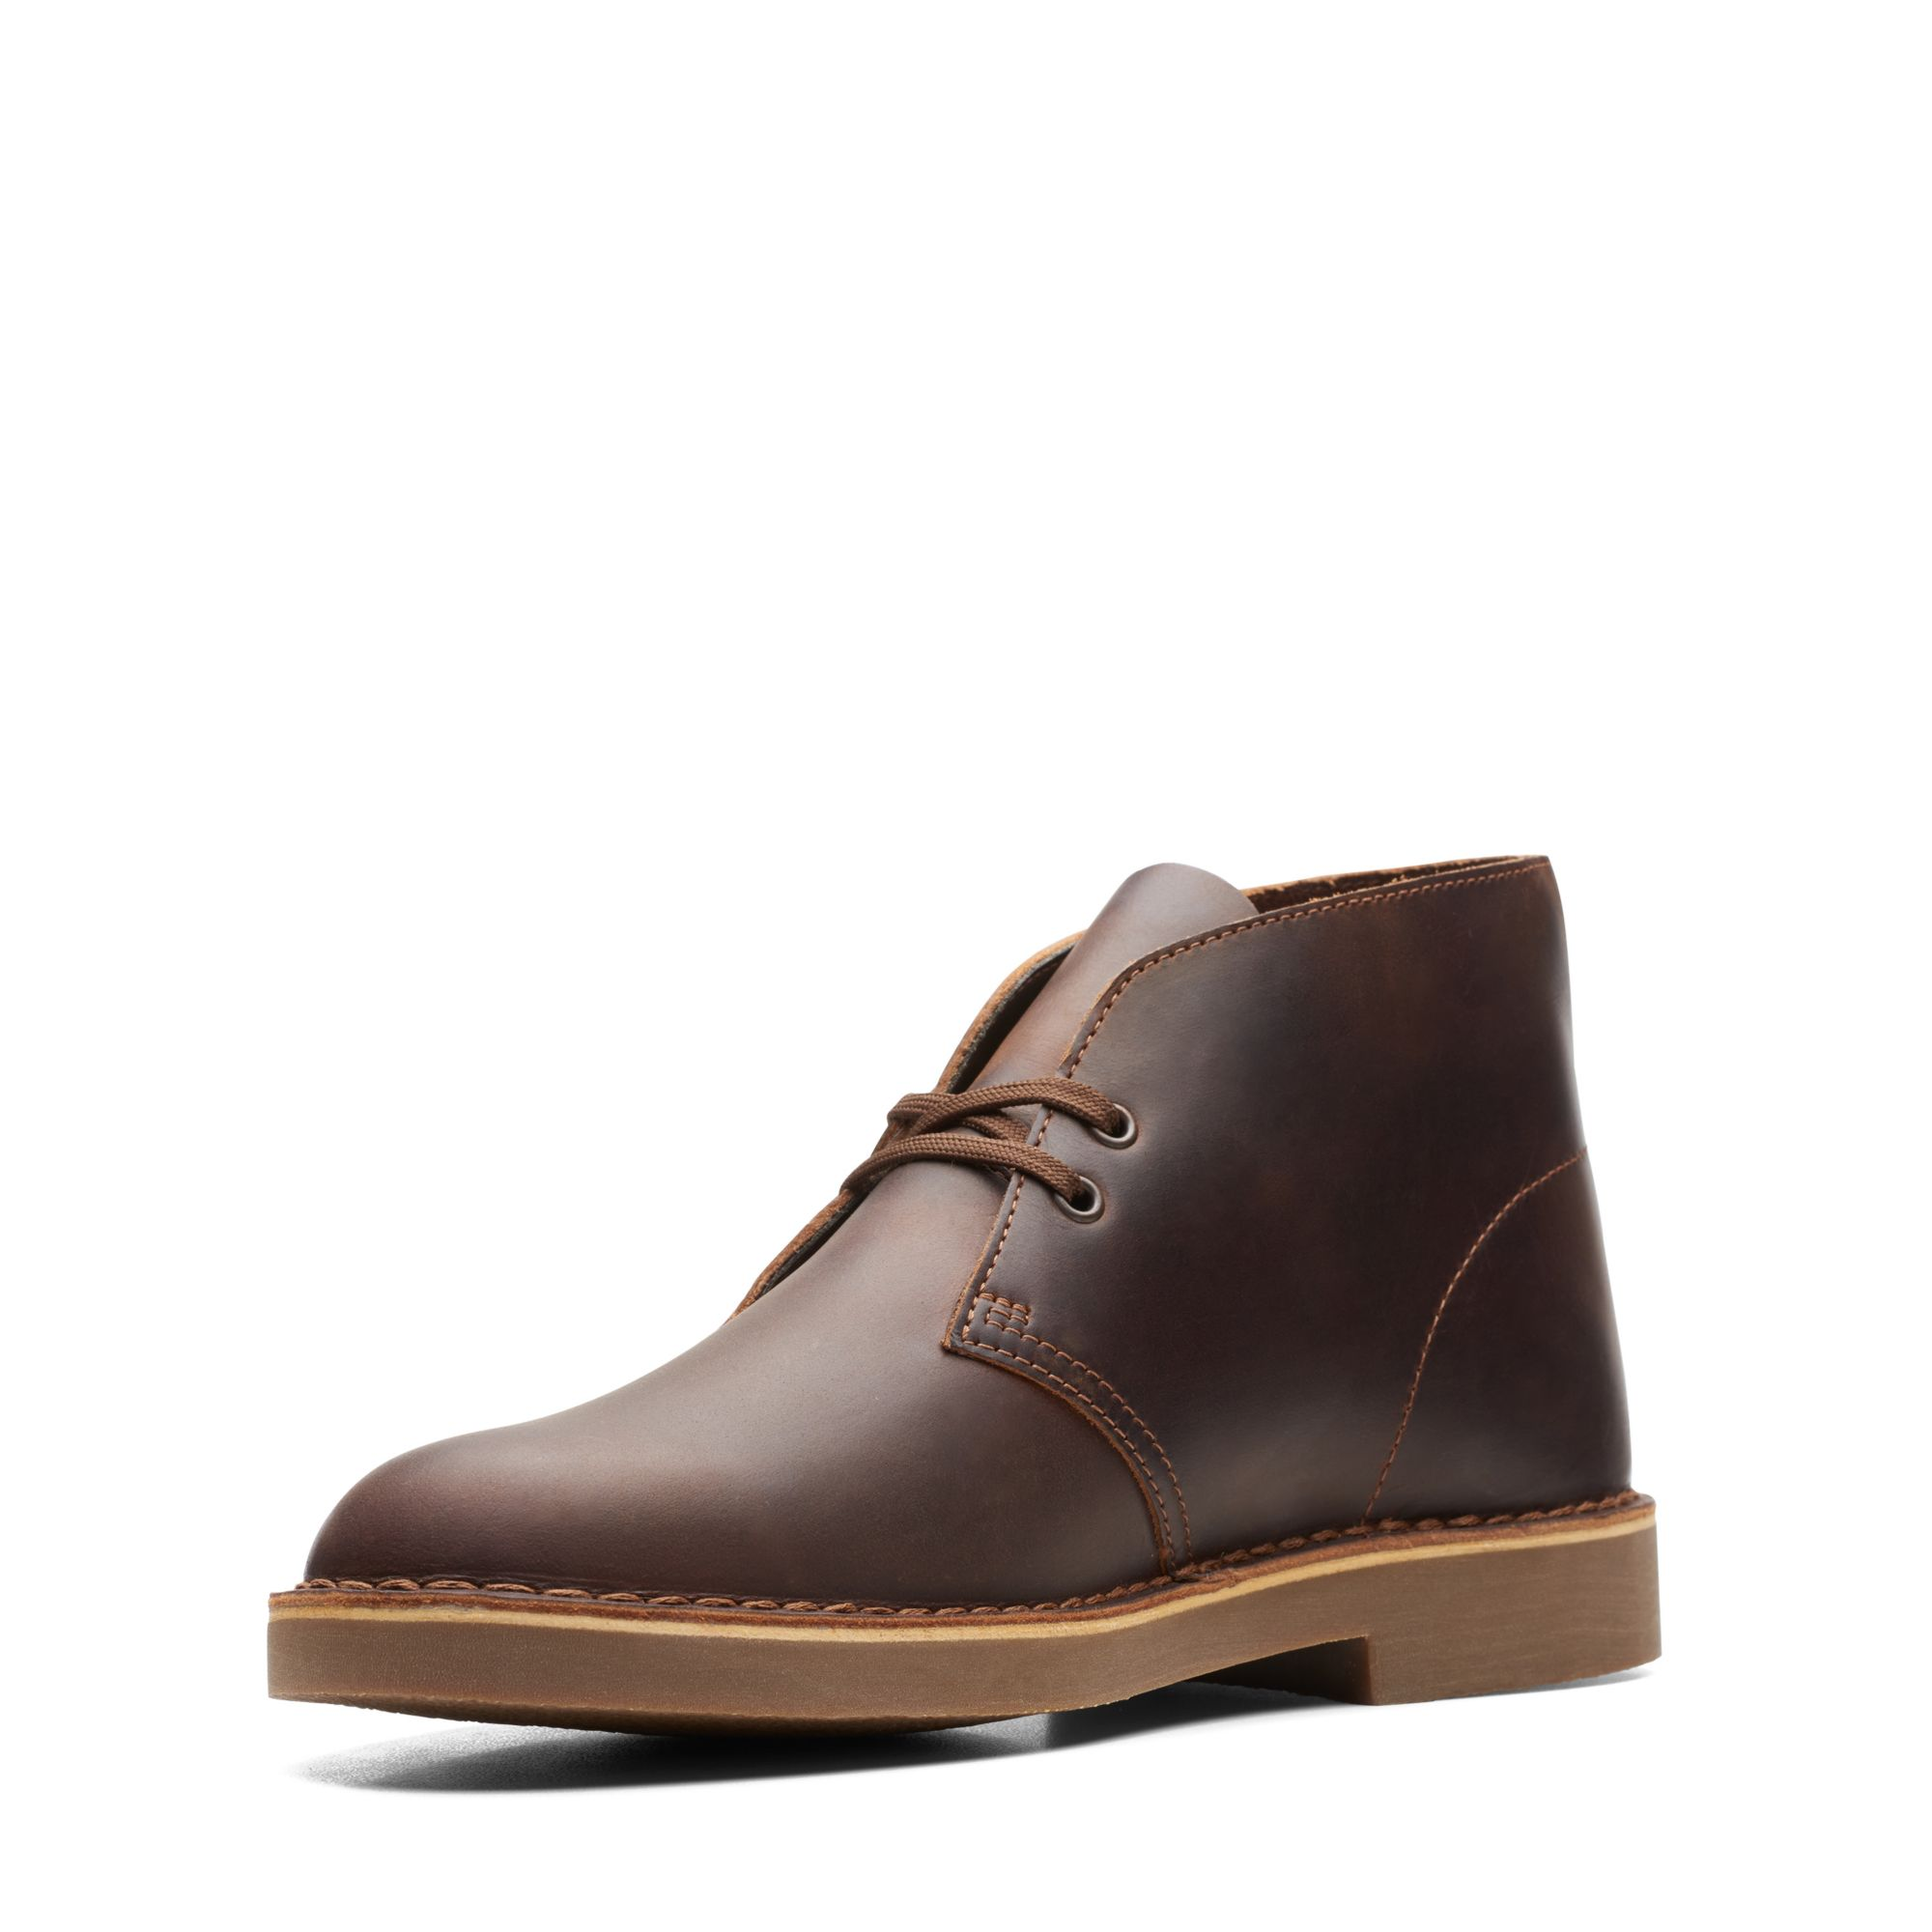 Класически унисекс обувки Clarks Desert Boot 2 Beeswax Leather - снимка 4